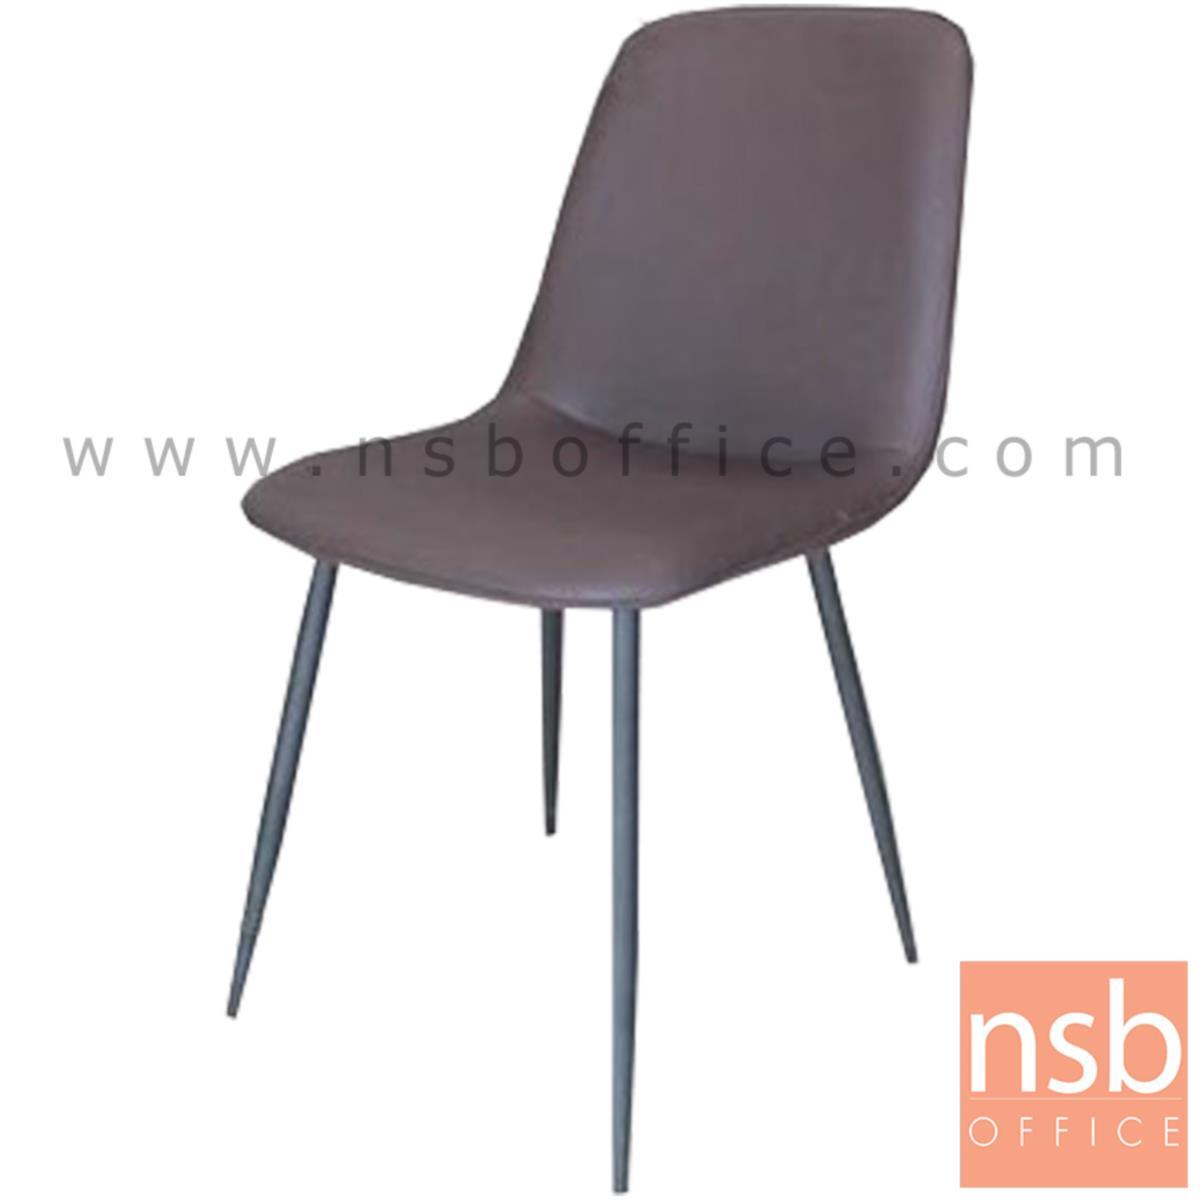 B22A174:เก้าอี้อเนกประสงค์ รุ่น KITTEN (คิทเทน) ขนาด 45W cm. ขาเหล็ก